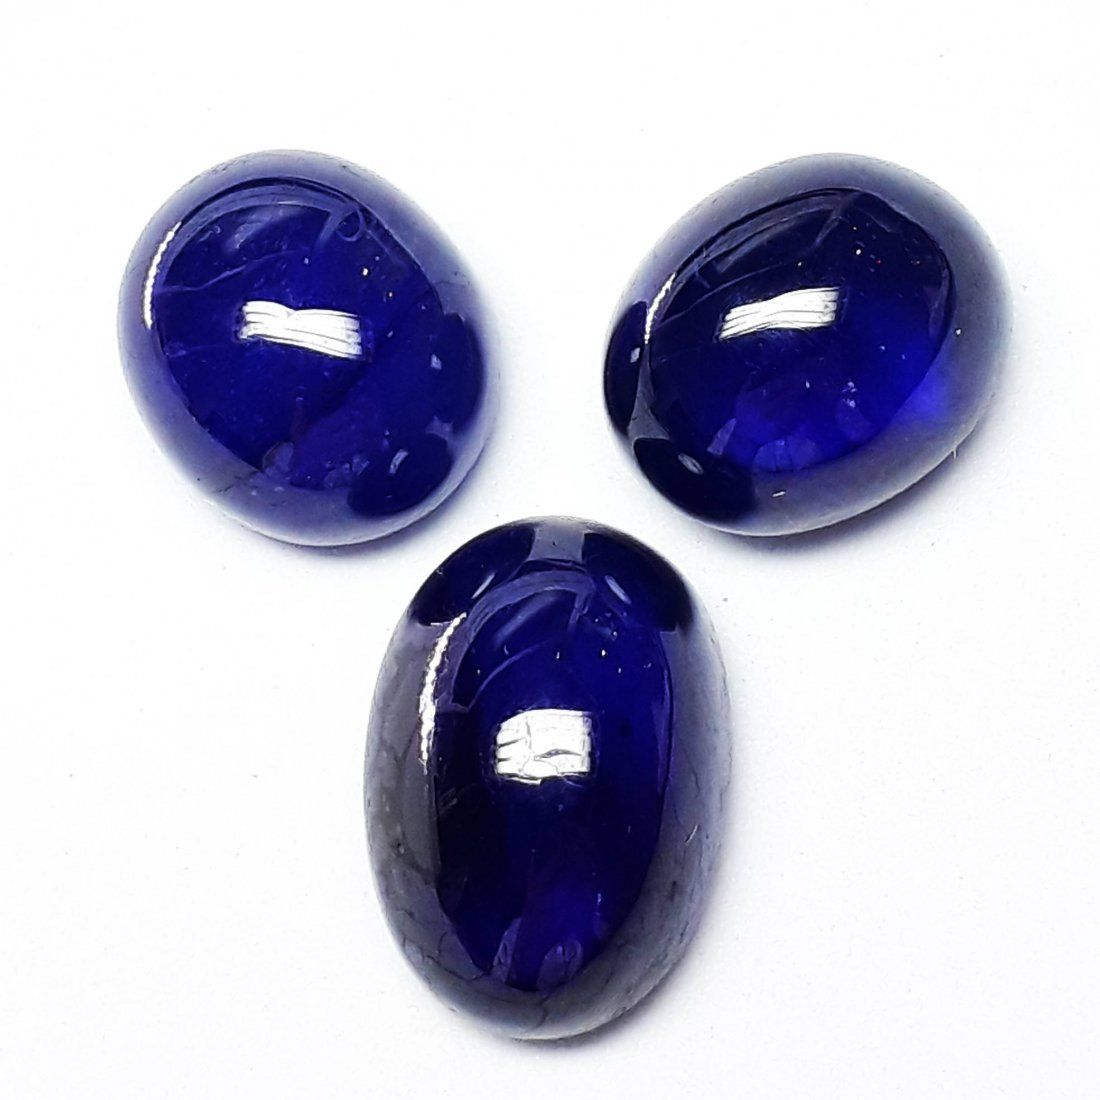 Natural Cabochon Blue Sapphire - 37.25 ct.